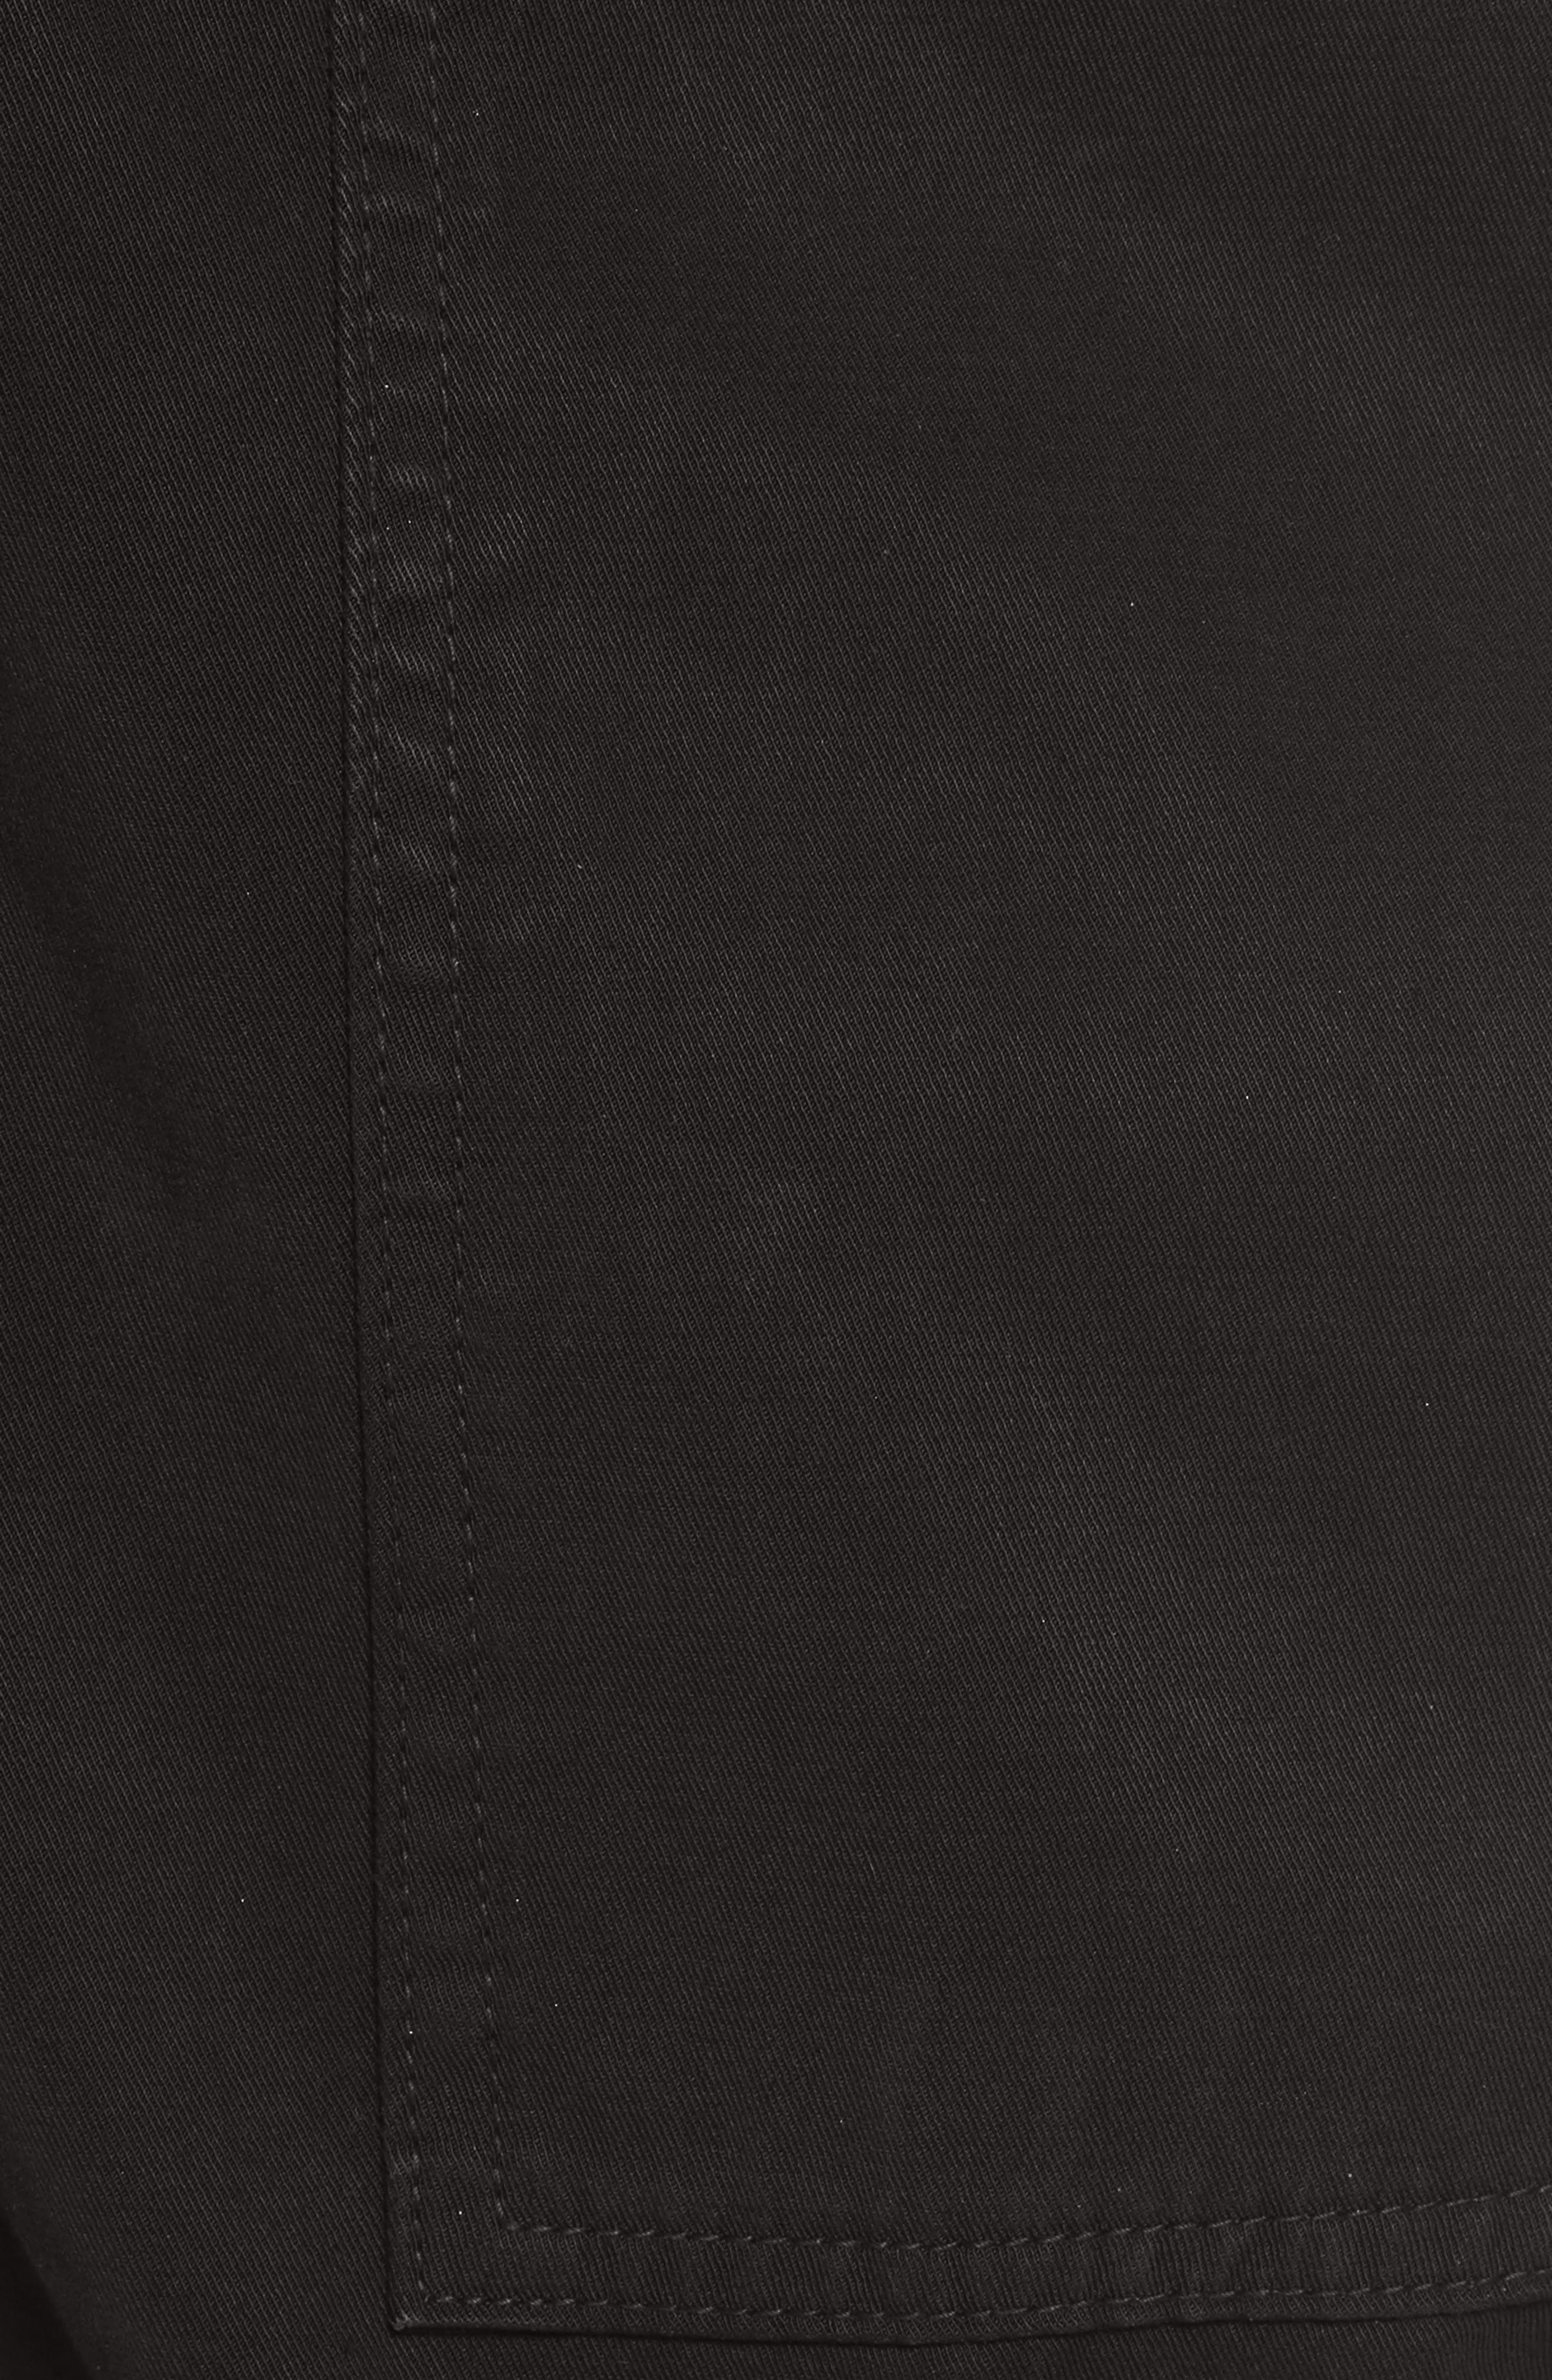 Jogger Pants,                             Alternate thumbnail 6, color,                             001